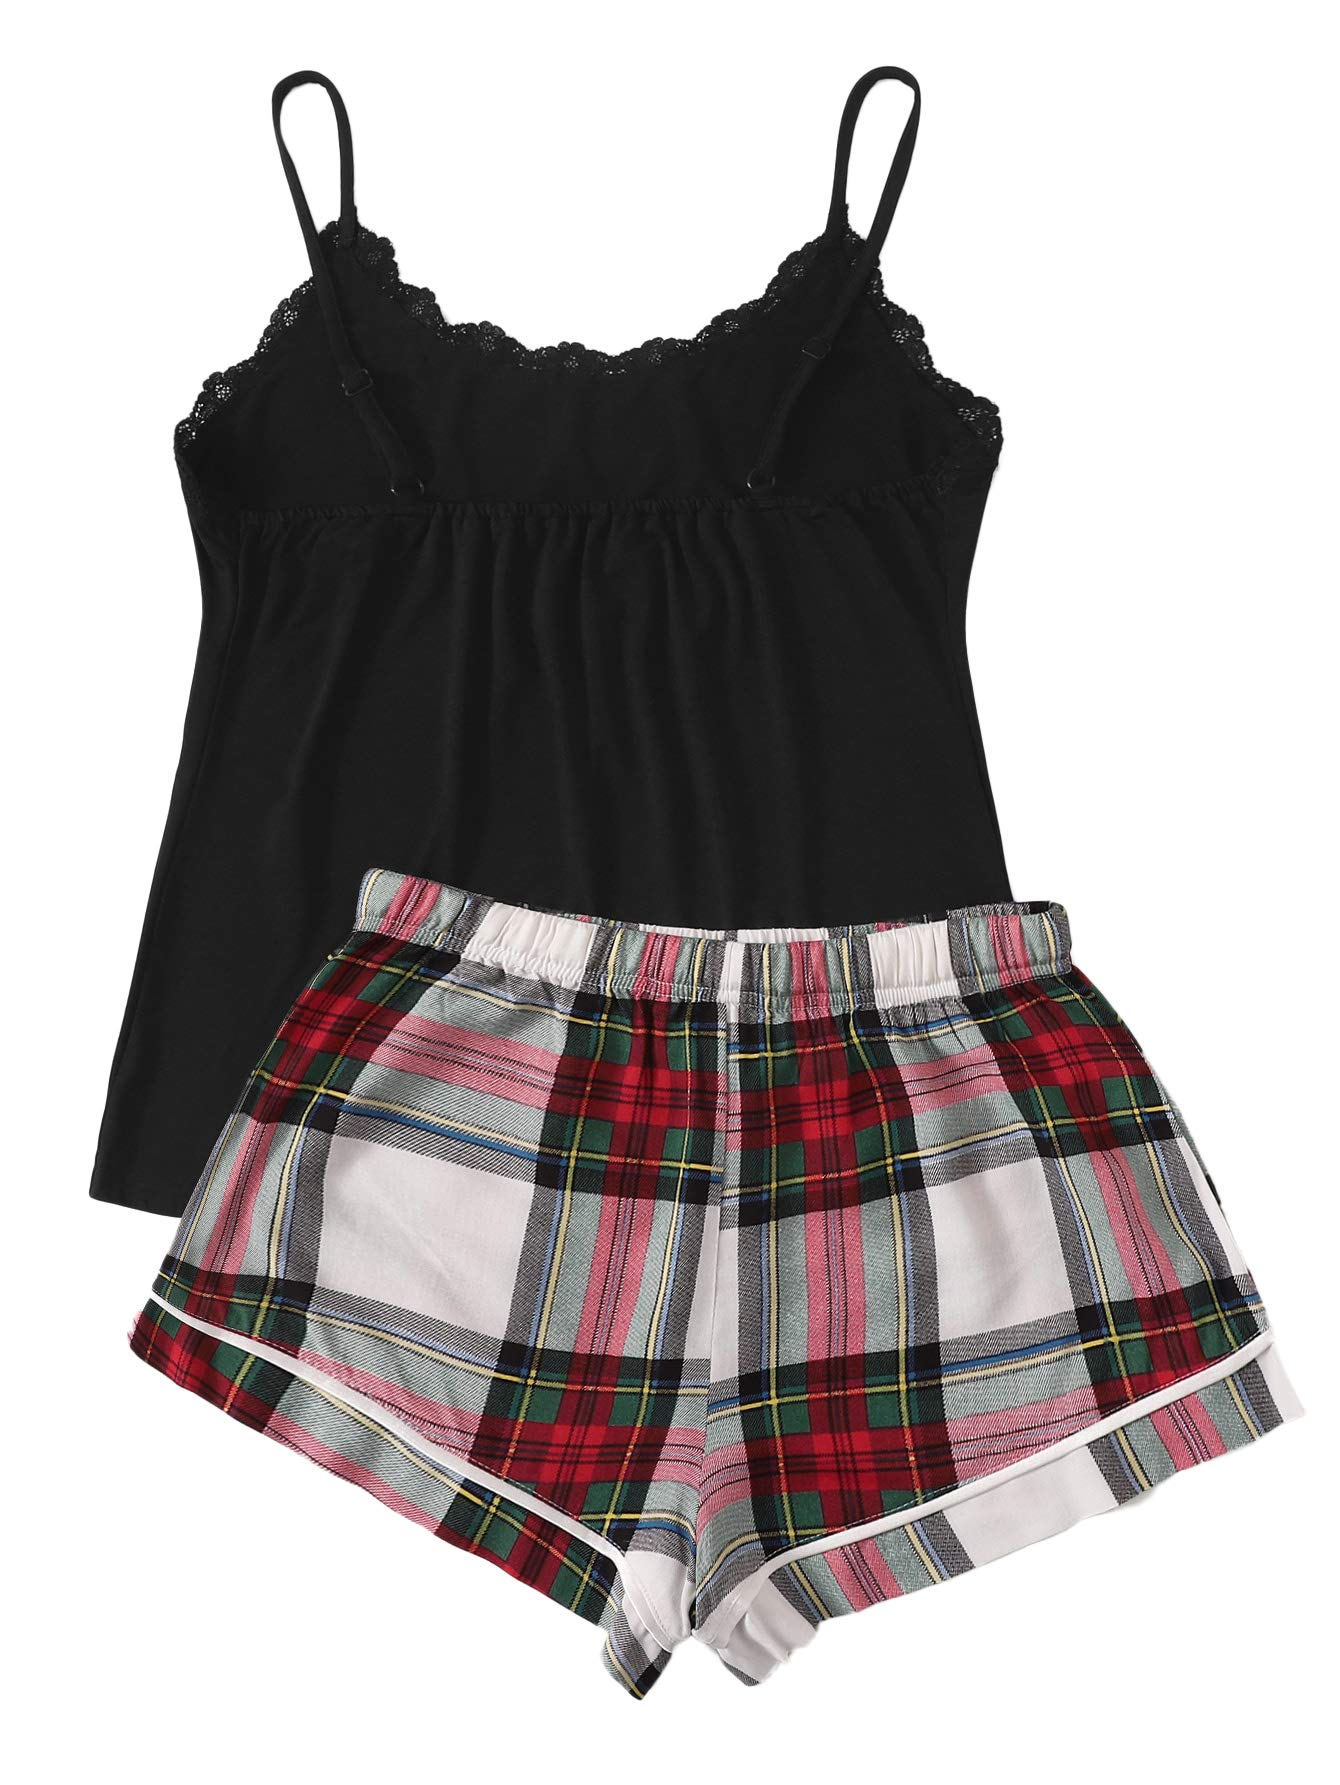 SweatyRocks Women's Sleepwear Set Letter Print Cami Top and Elastic Waist Short Pajama Set